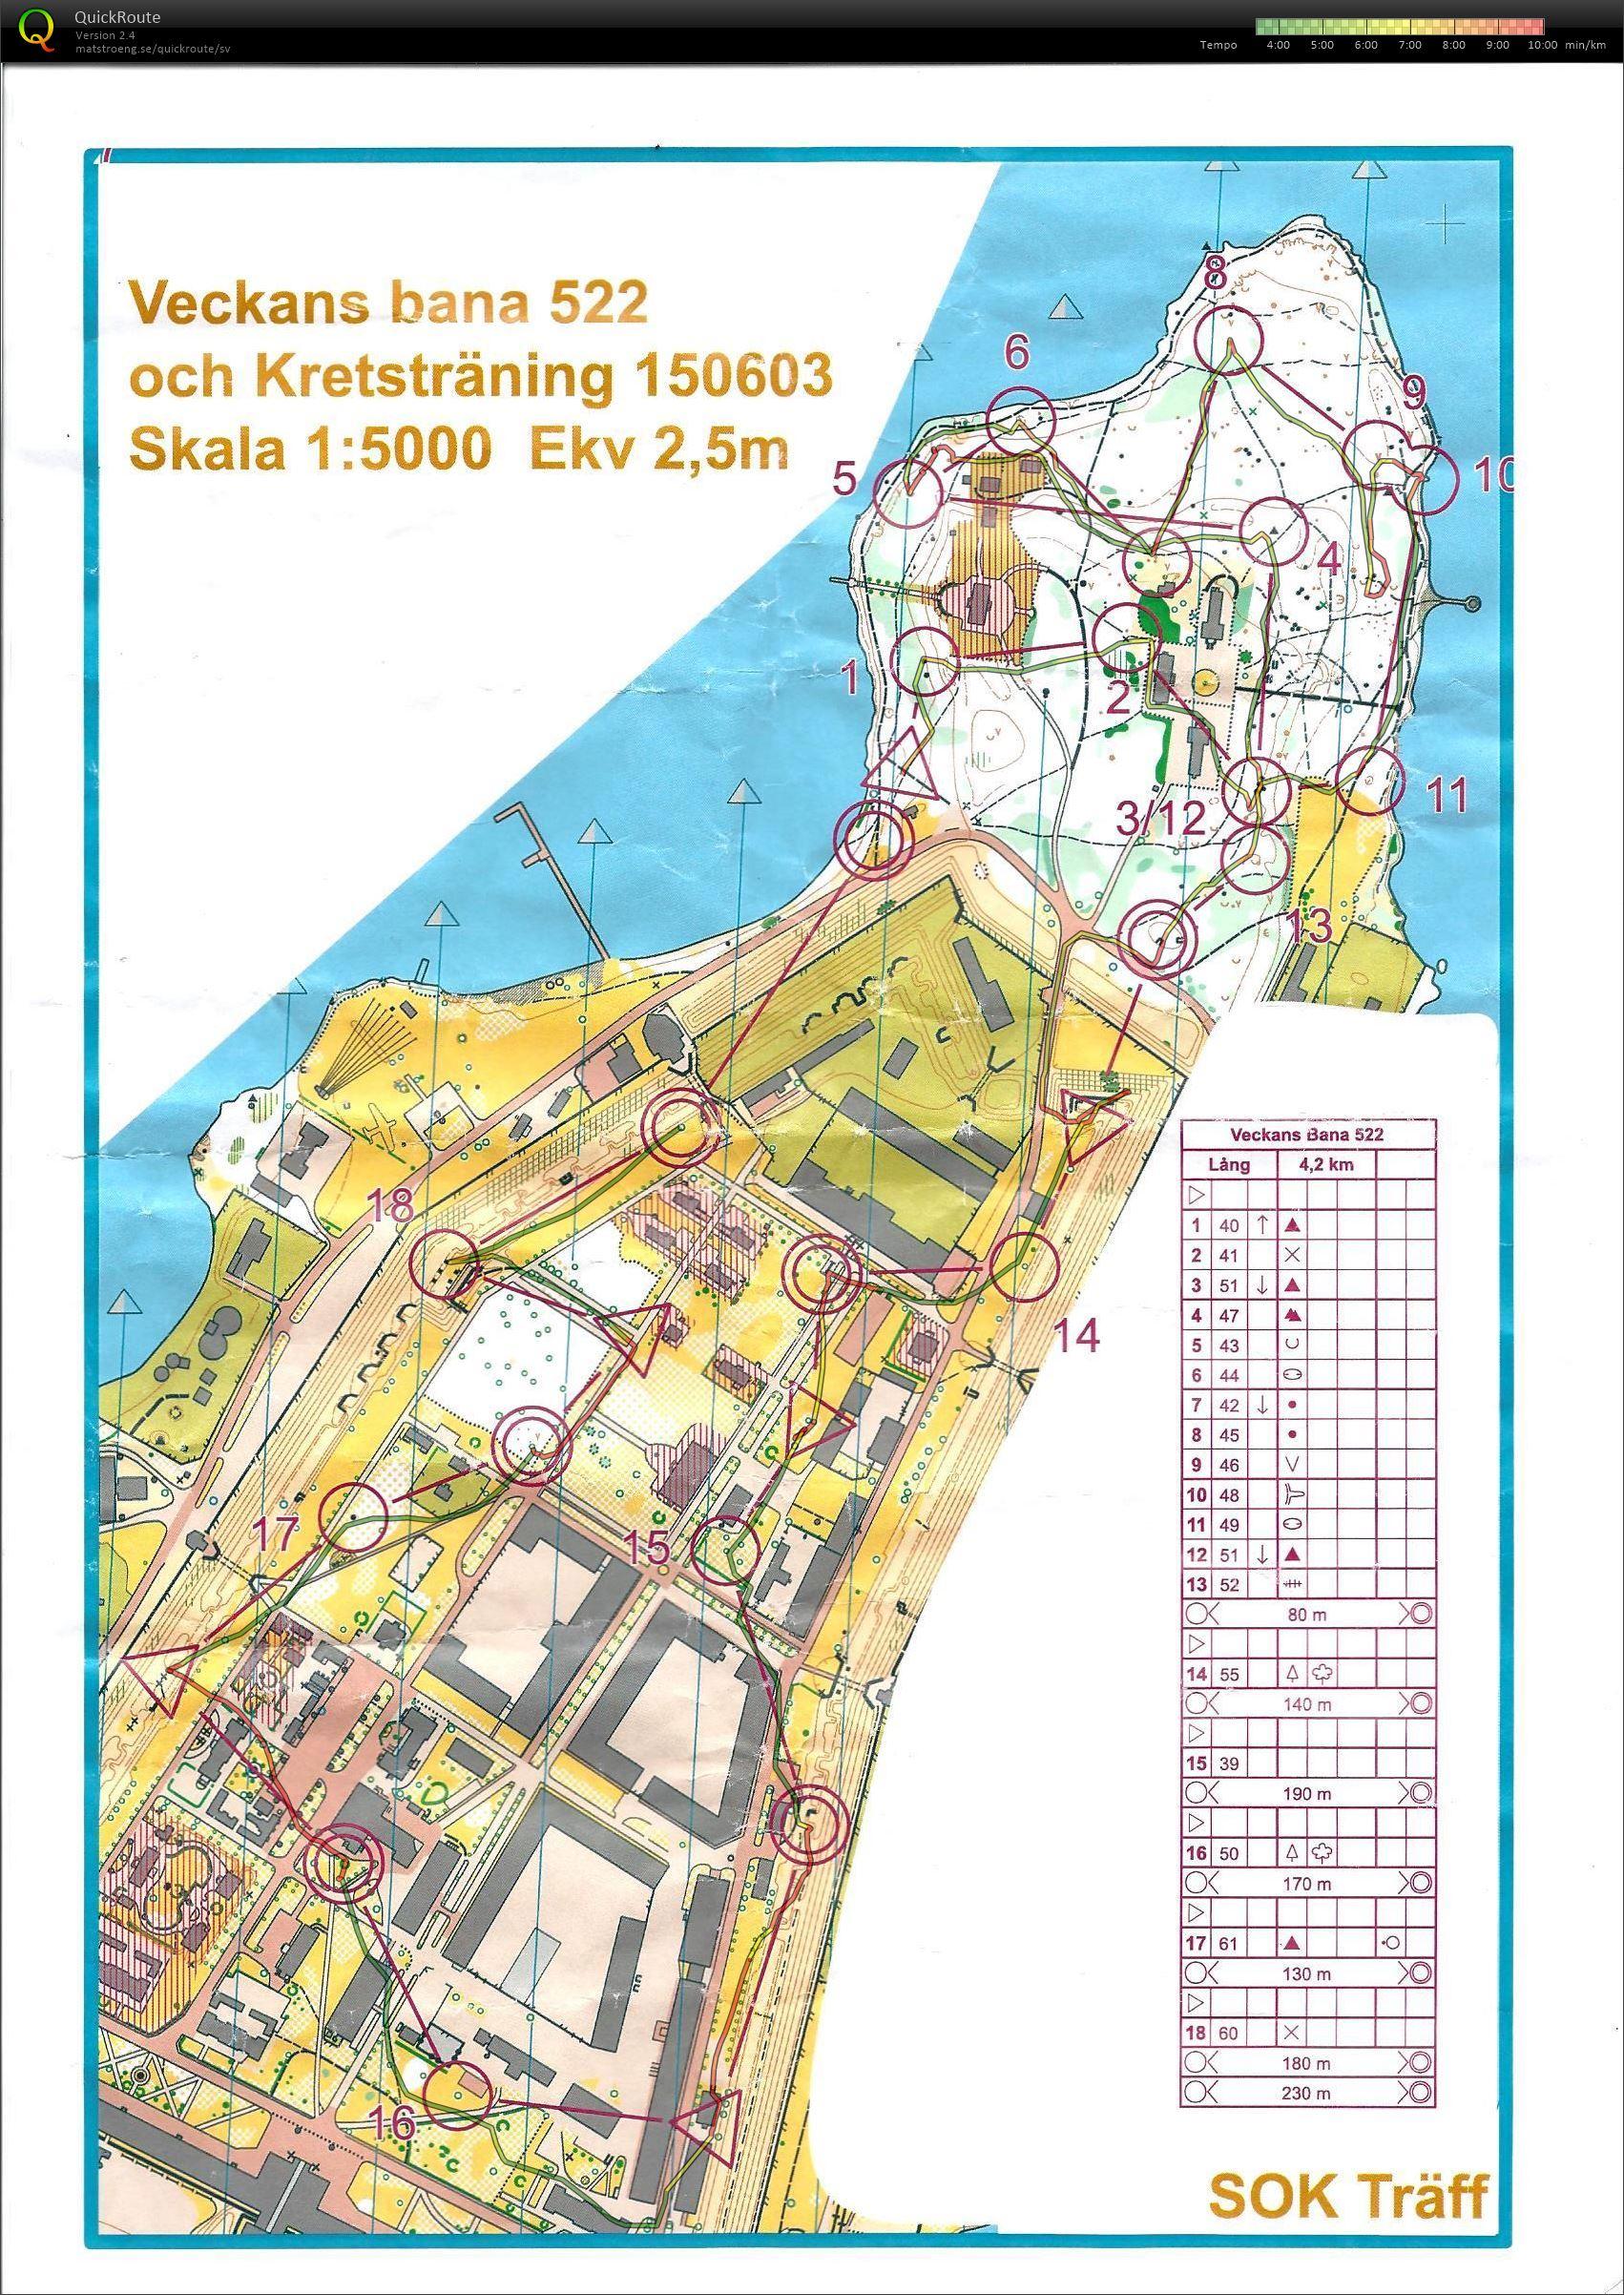 karlsborg karta Marcus Carlssons digitala kartarkiv :: Kretsträning Karlsb karlsborg karta